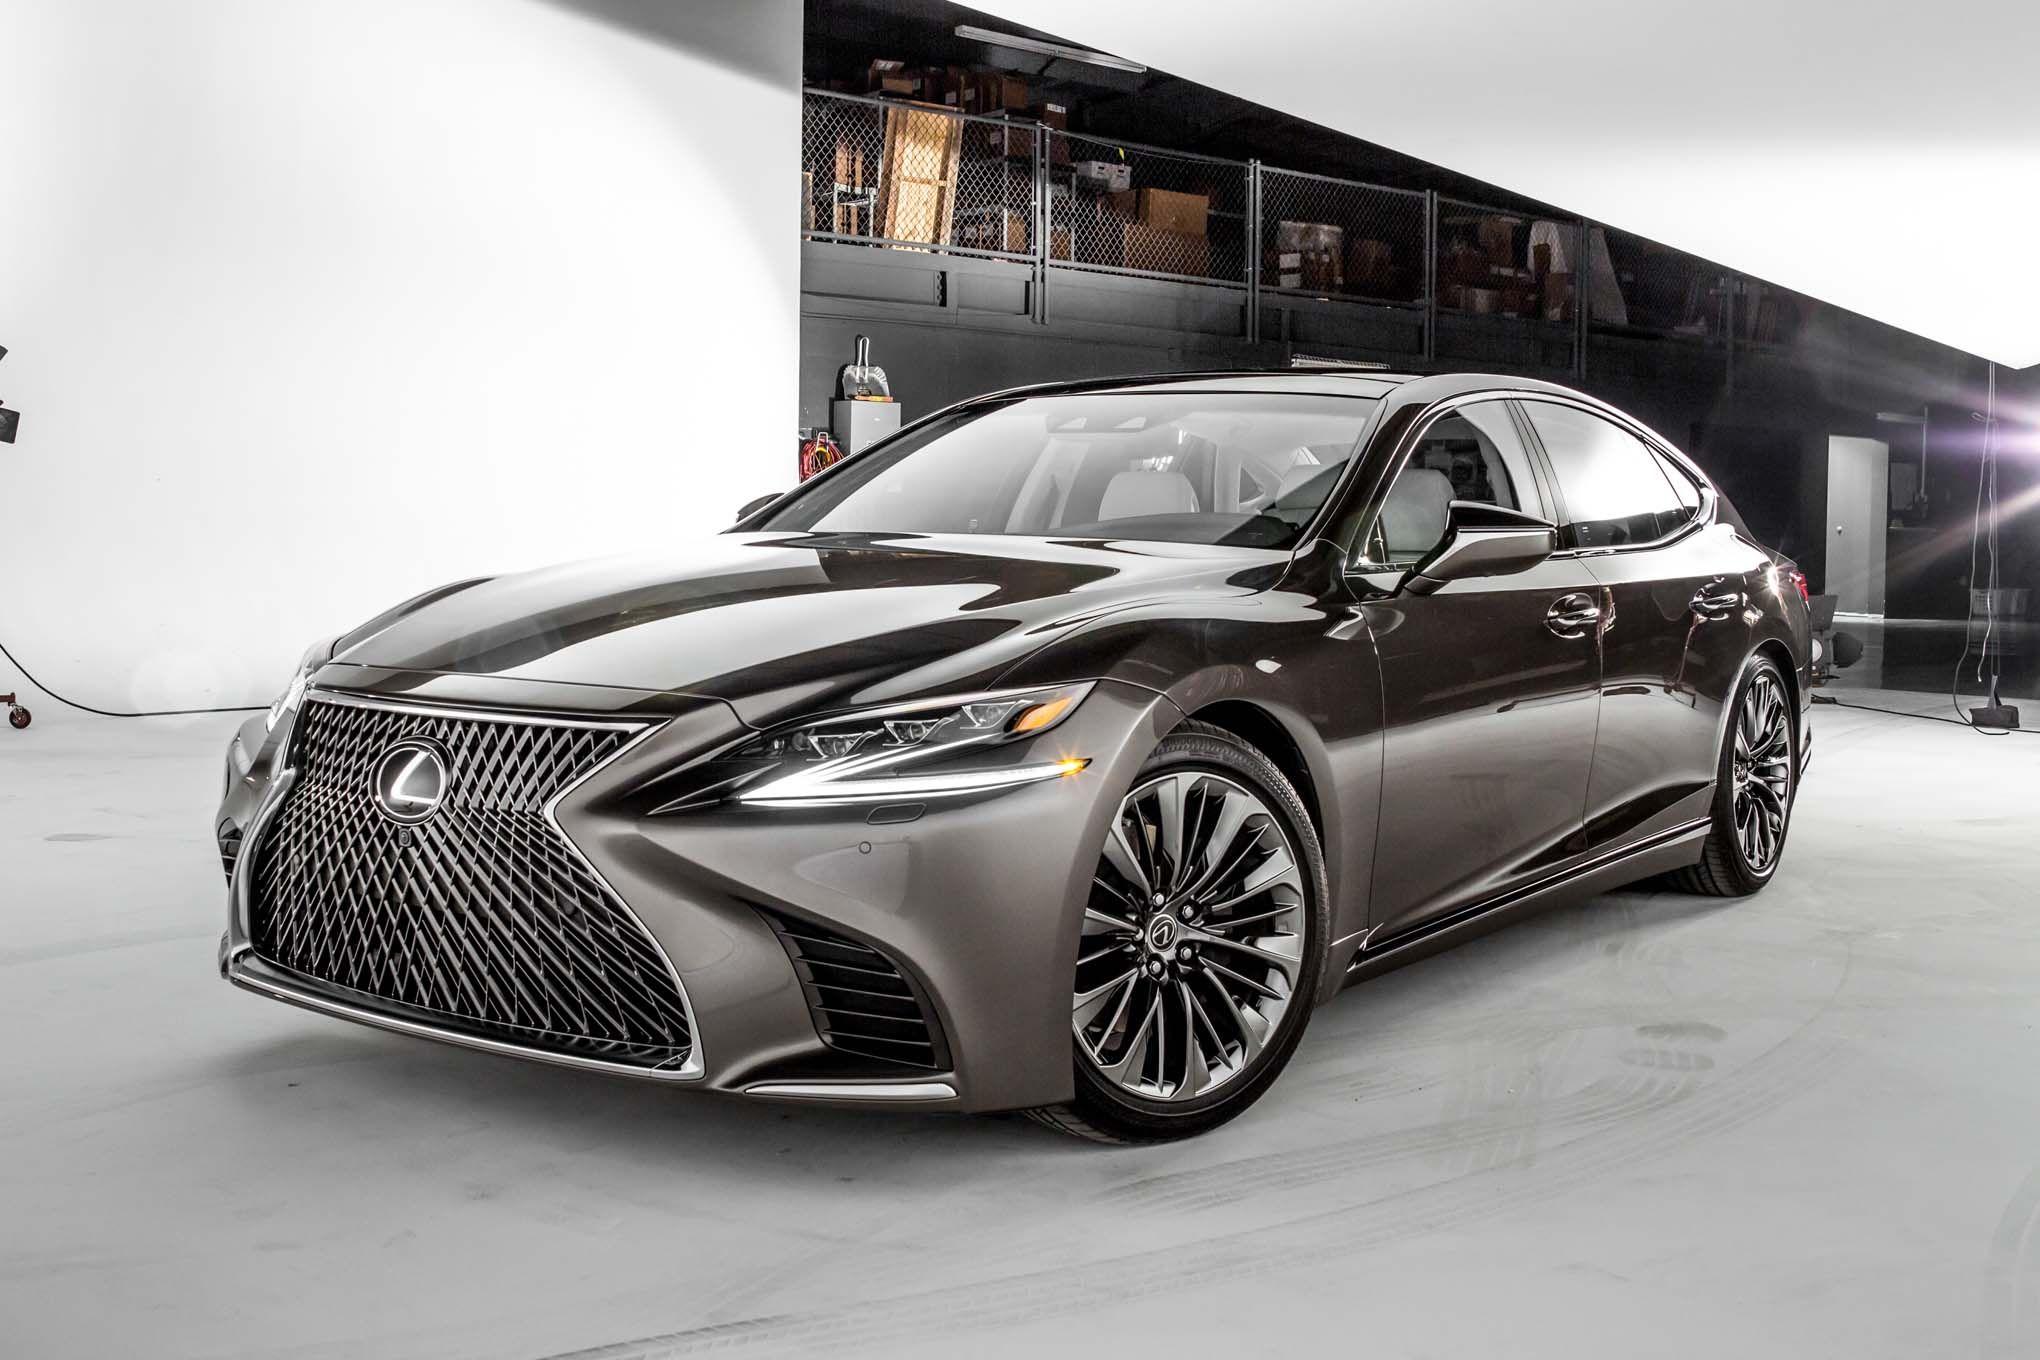 Detroit otomobil fuarında a§Ä±lan 2018 lexus ls